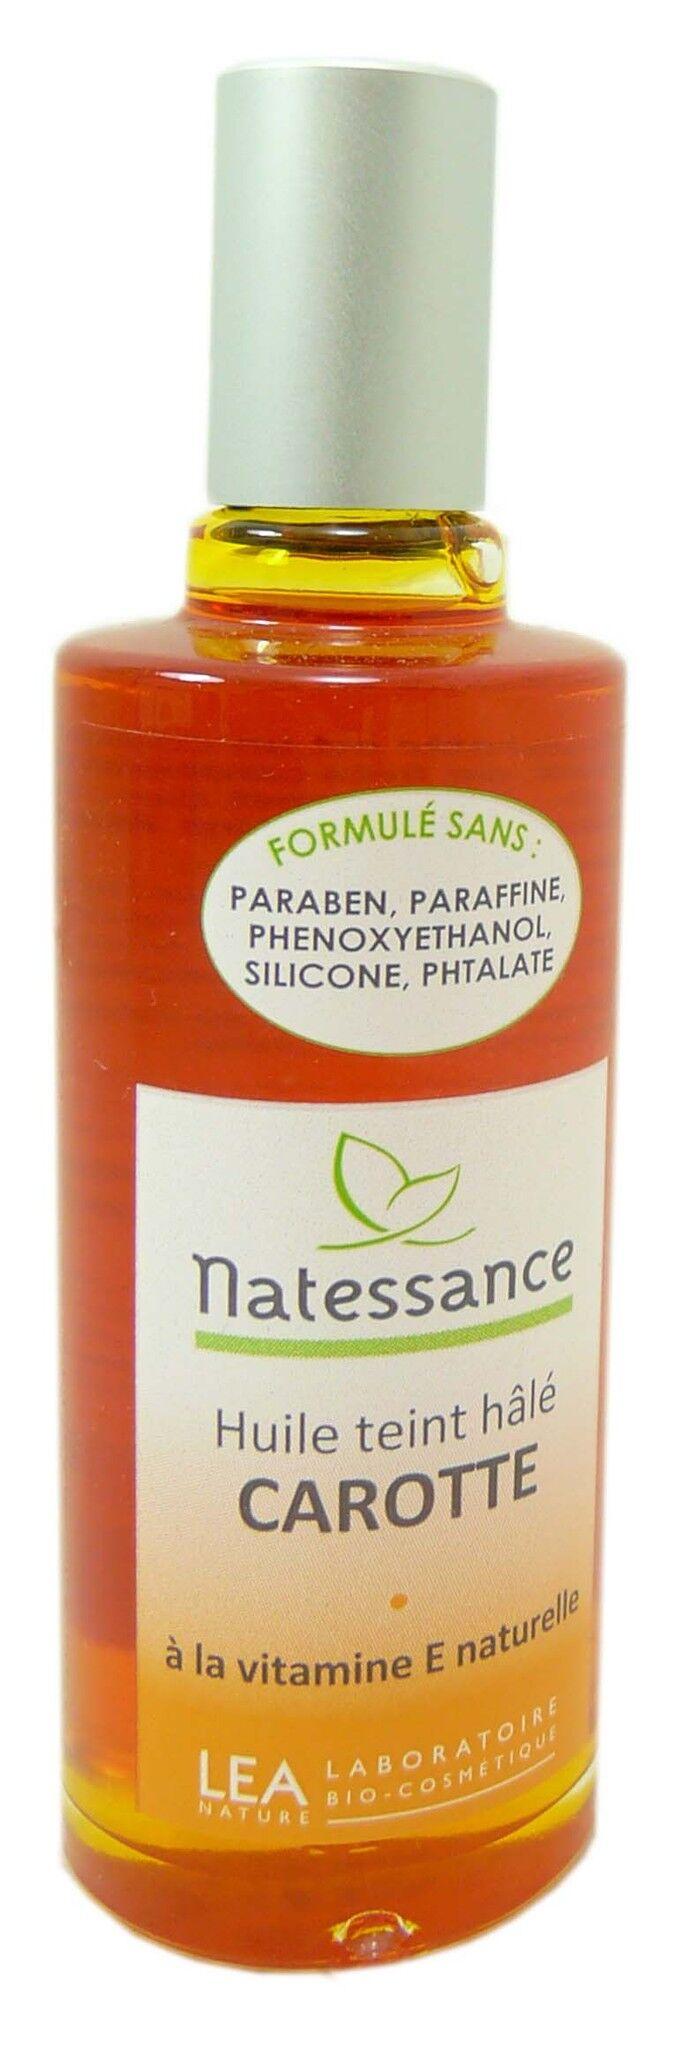 Natessance huile de carotte 50ml